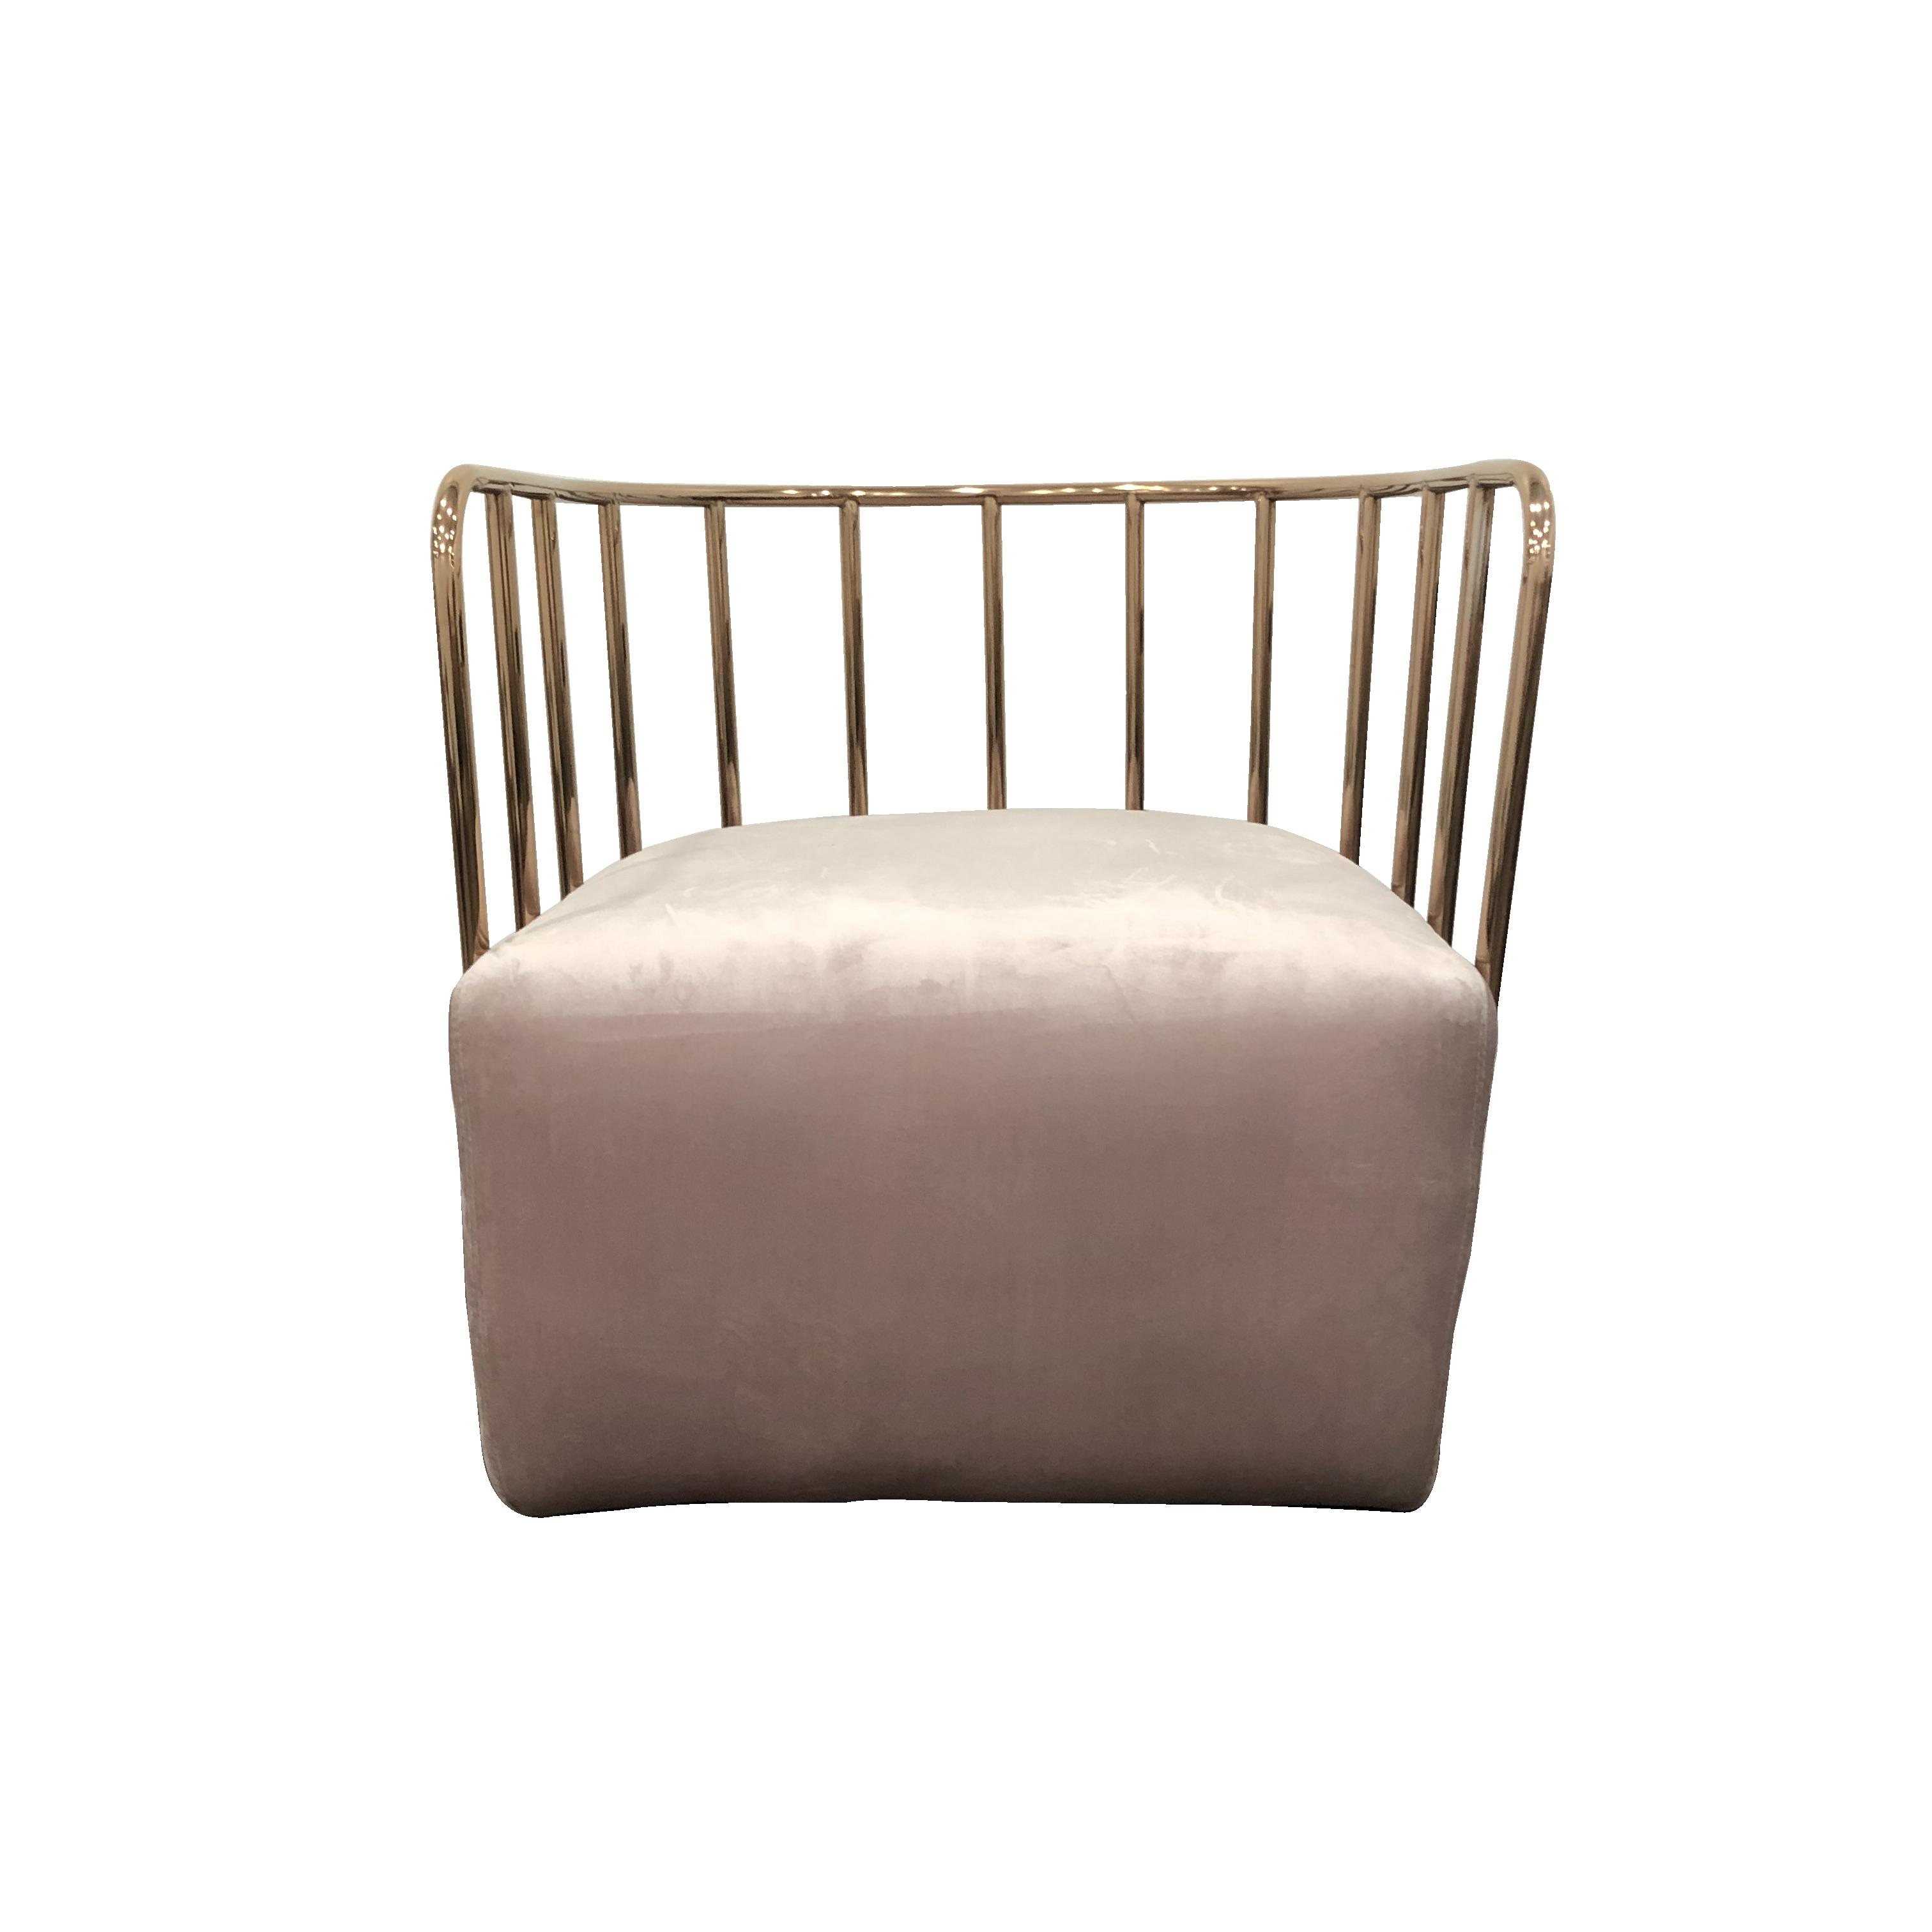 Astounding Rose Gold Chair Blush Velvet Seat Furniture Chairs Lamtechconsult Wood Chair Design Ideas Lamtechconsultcom